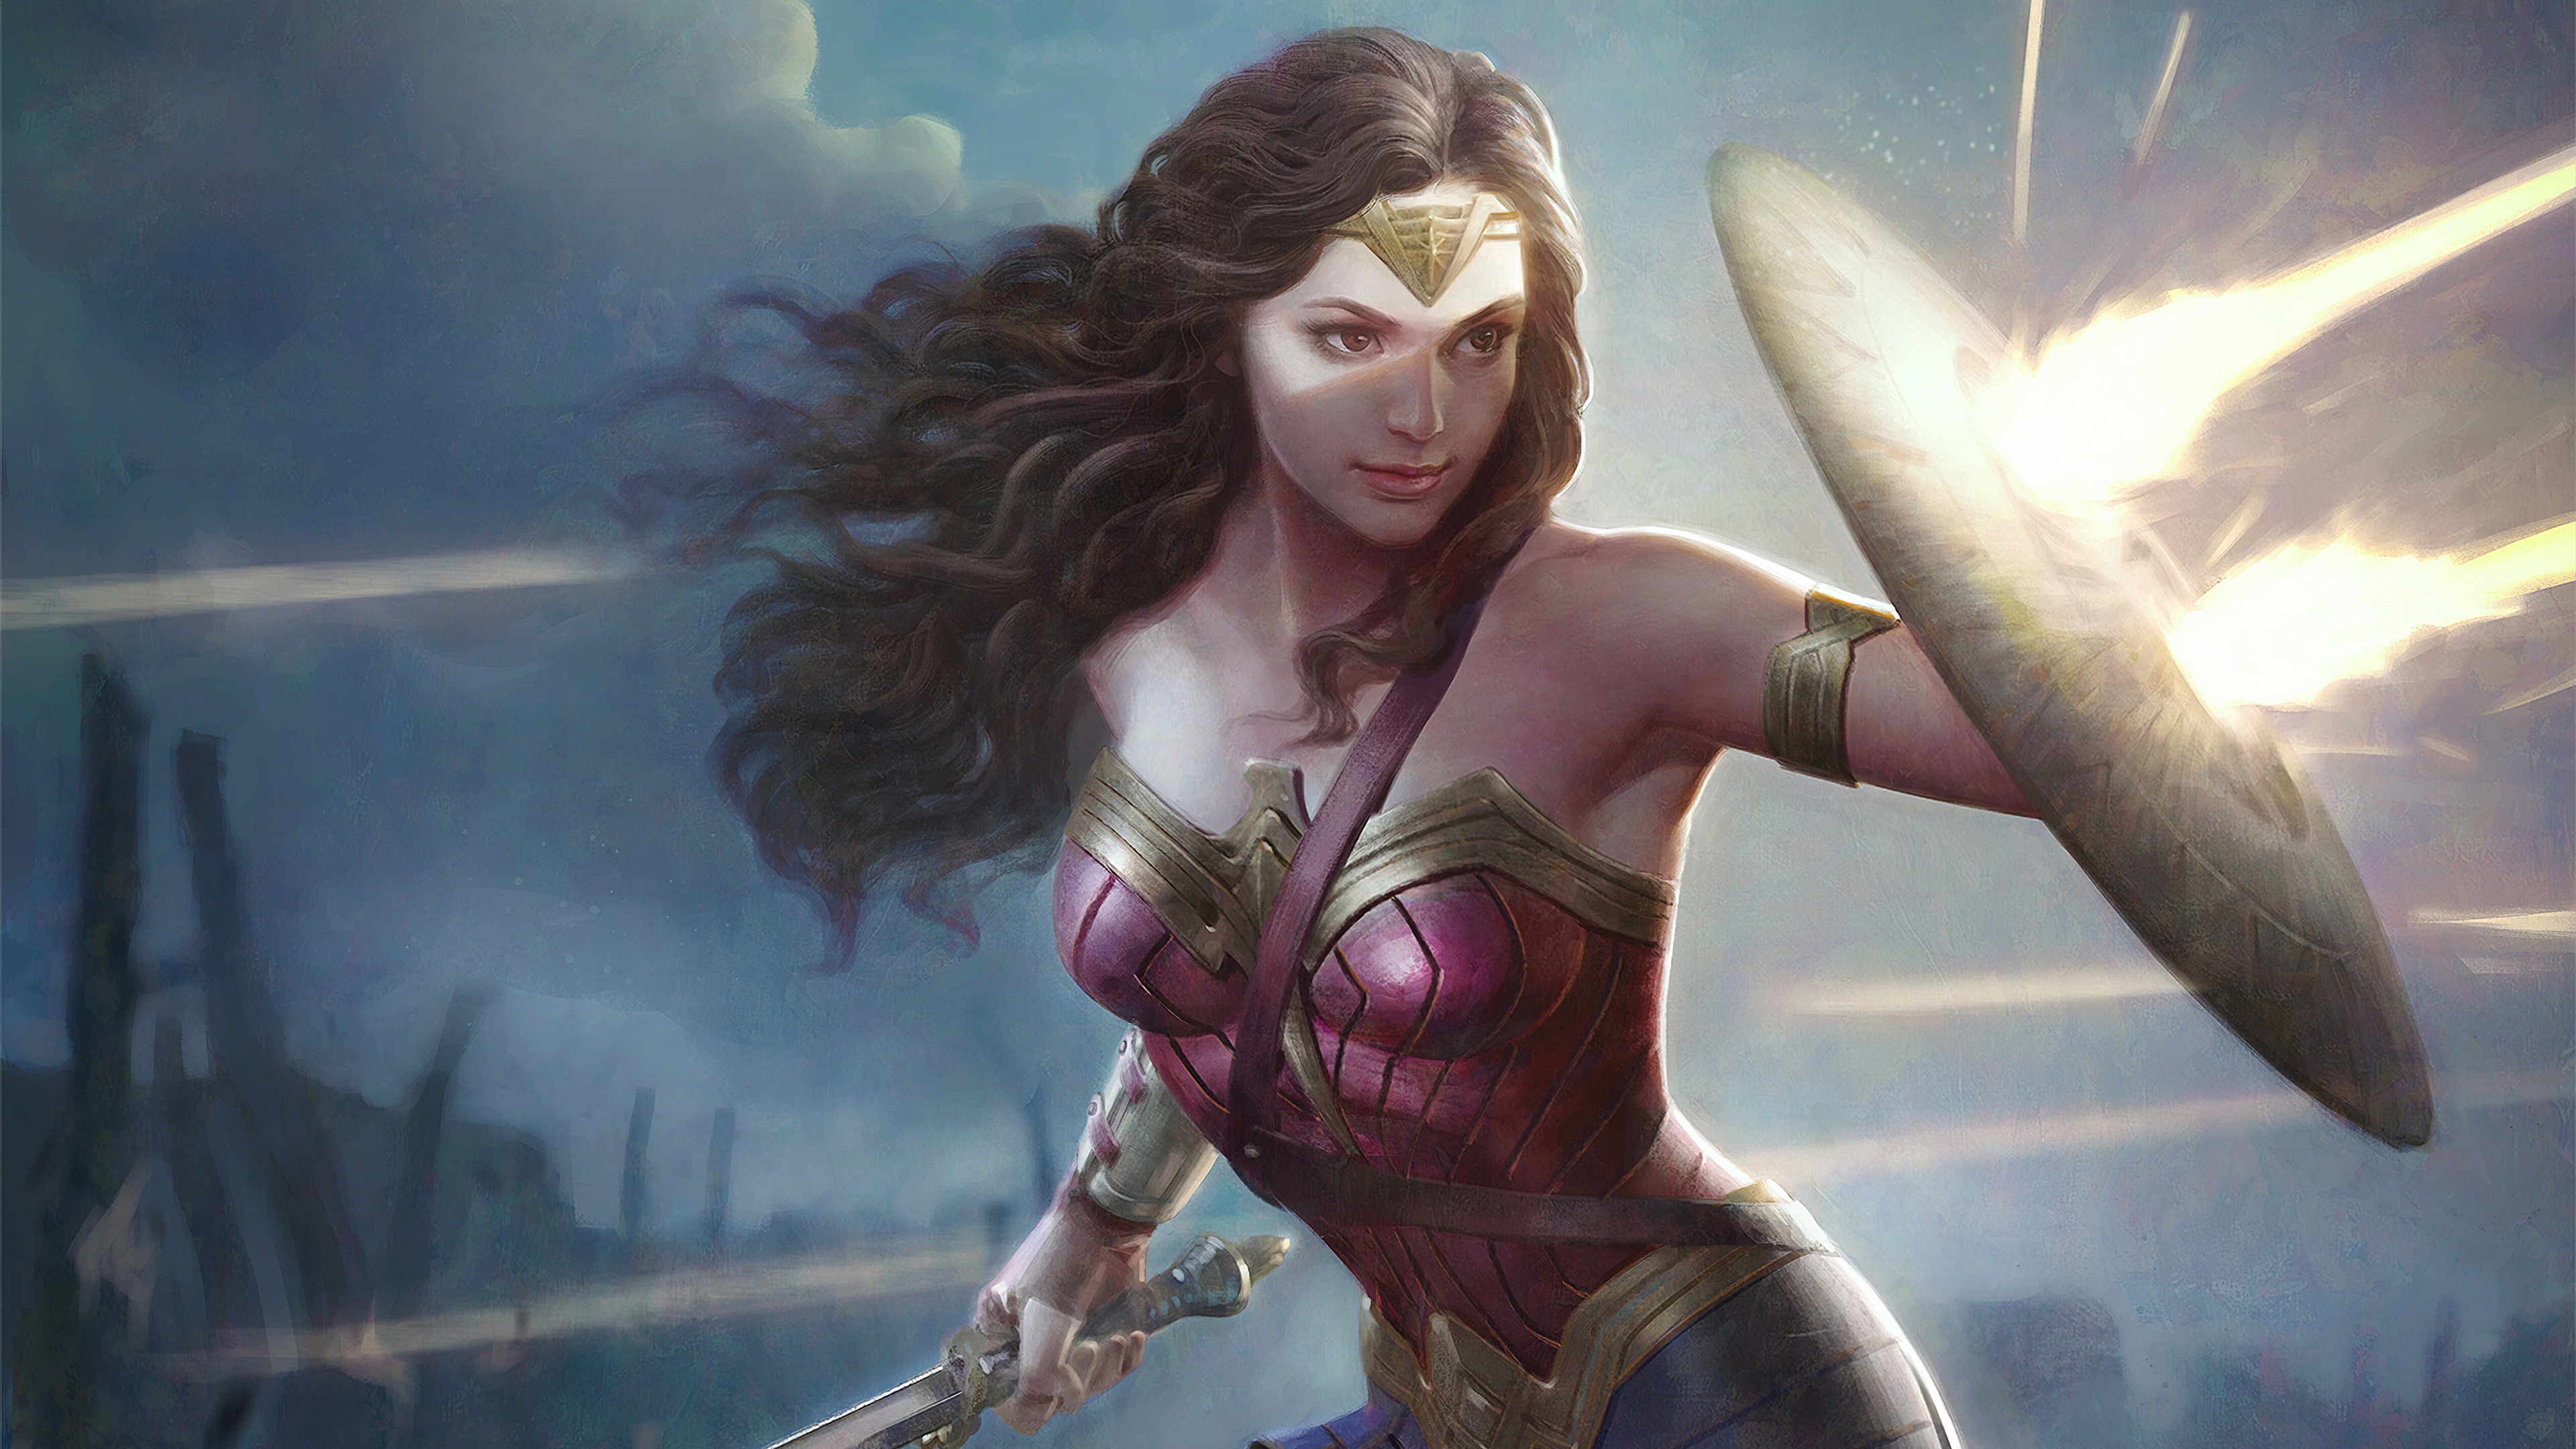 Wallpaper 4k Wonder Woman Shieldart 4k Wallpapers Artist